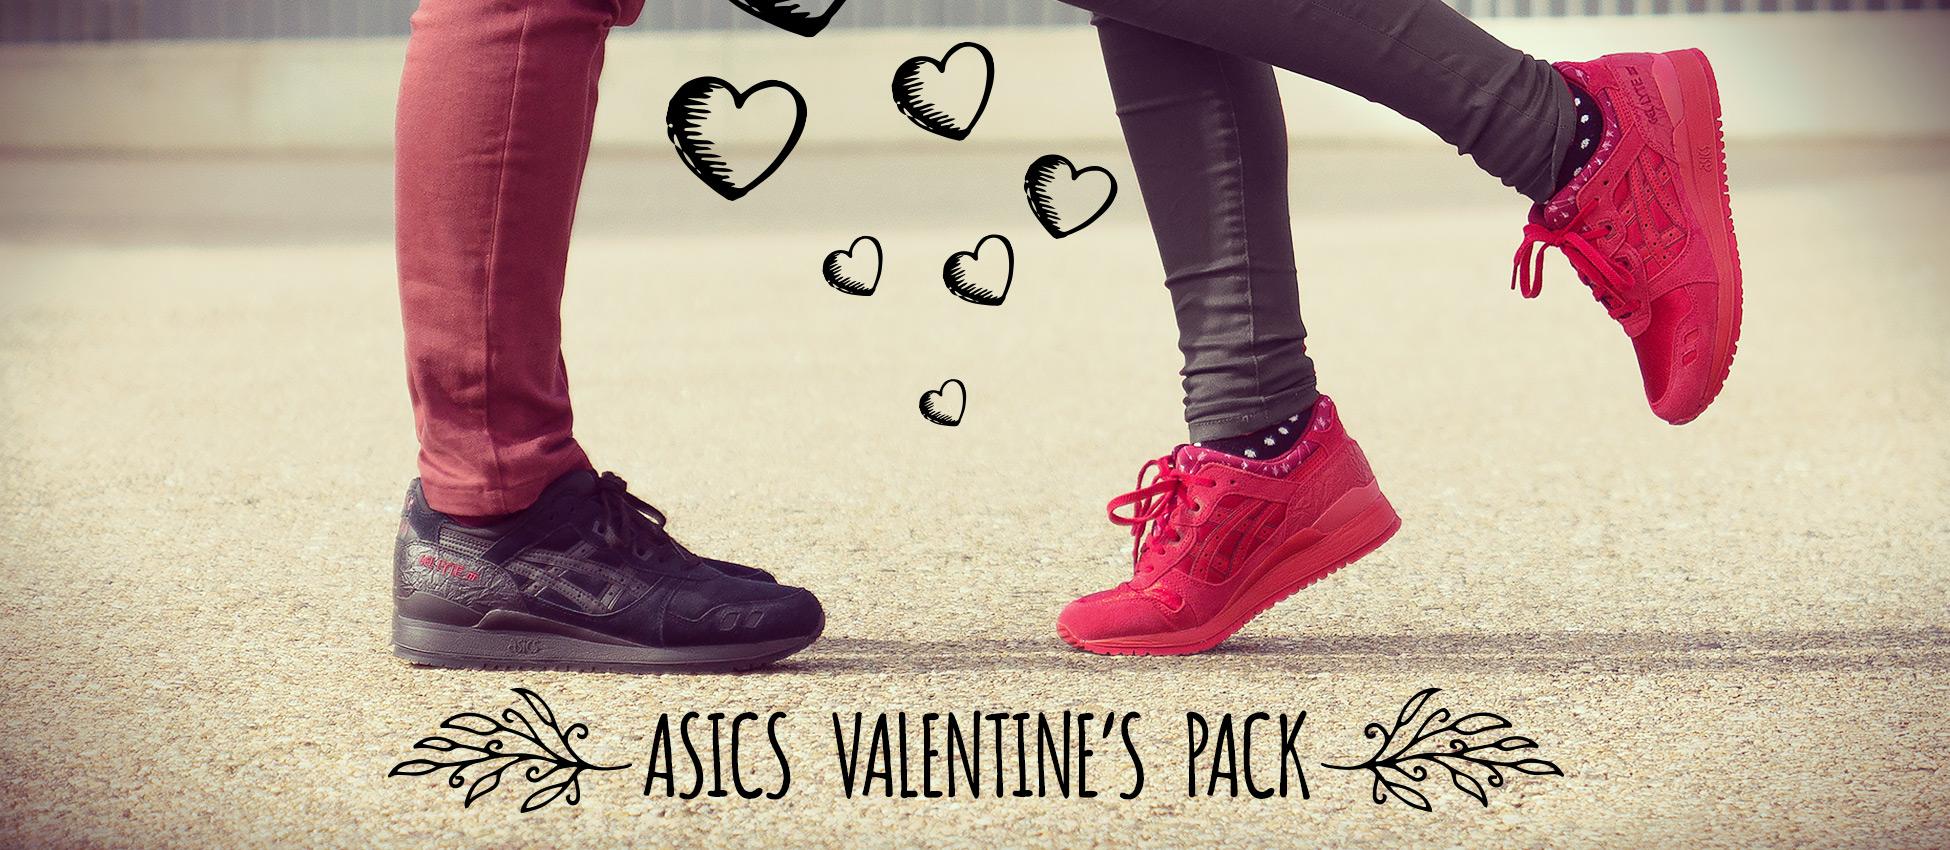 Asics Valentine